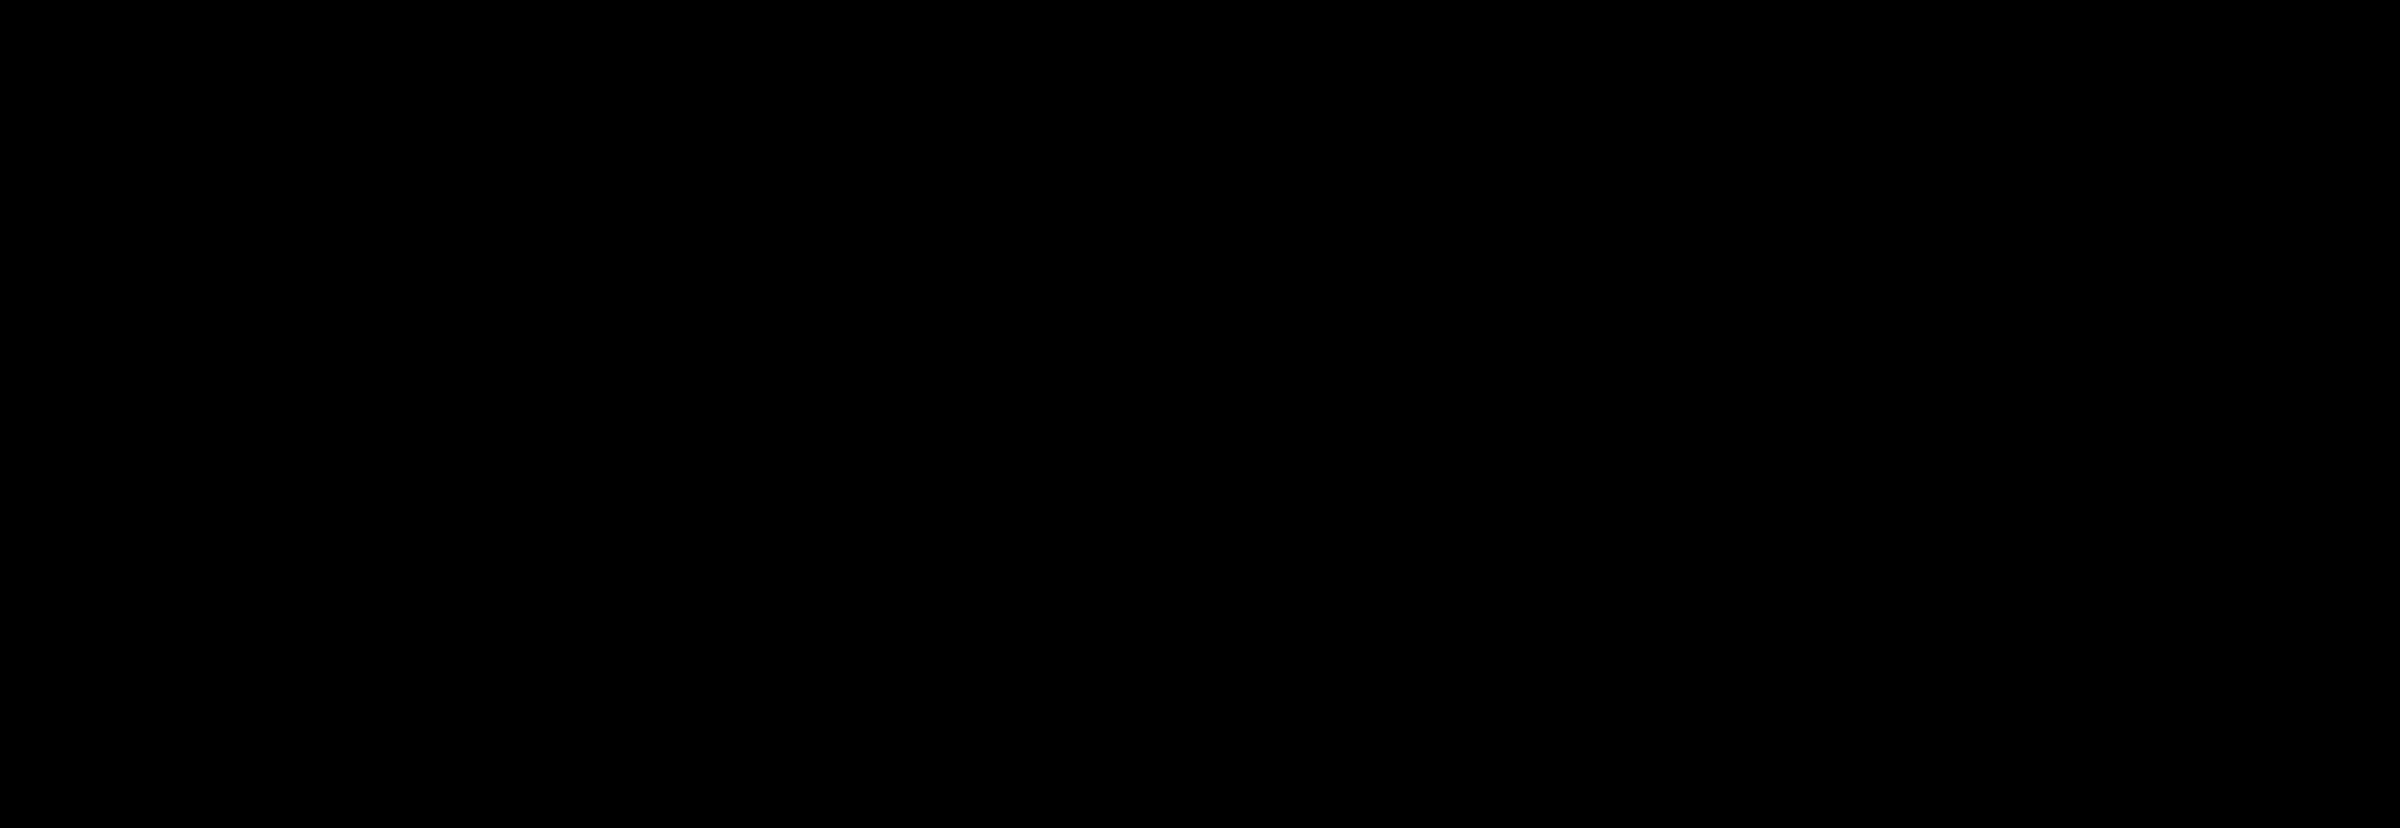 Keys PNG Black And White - 153906